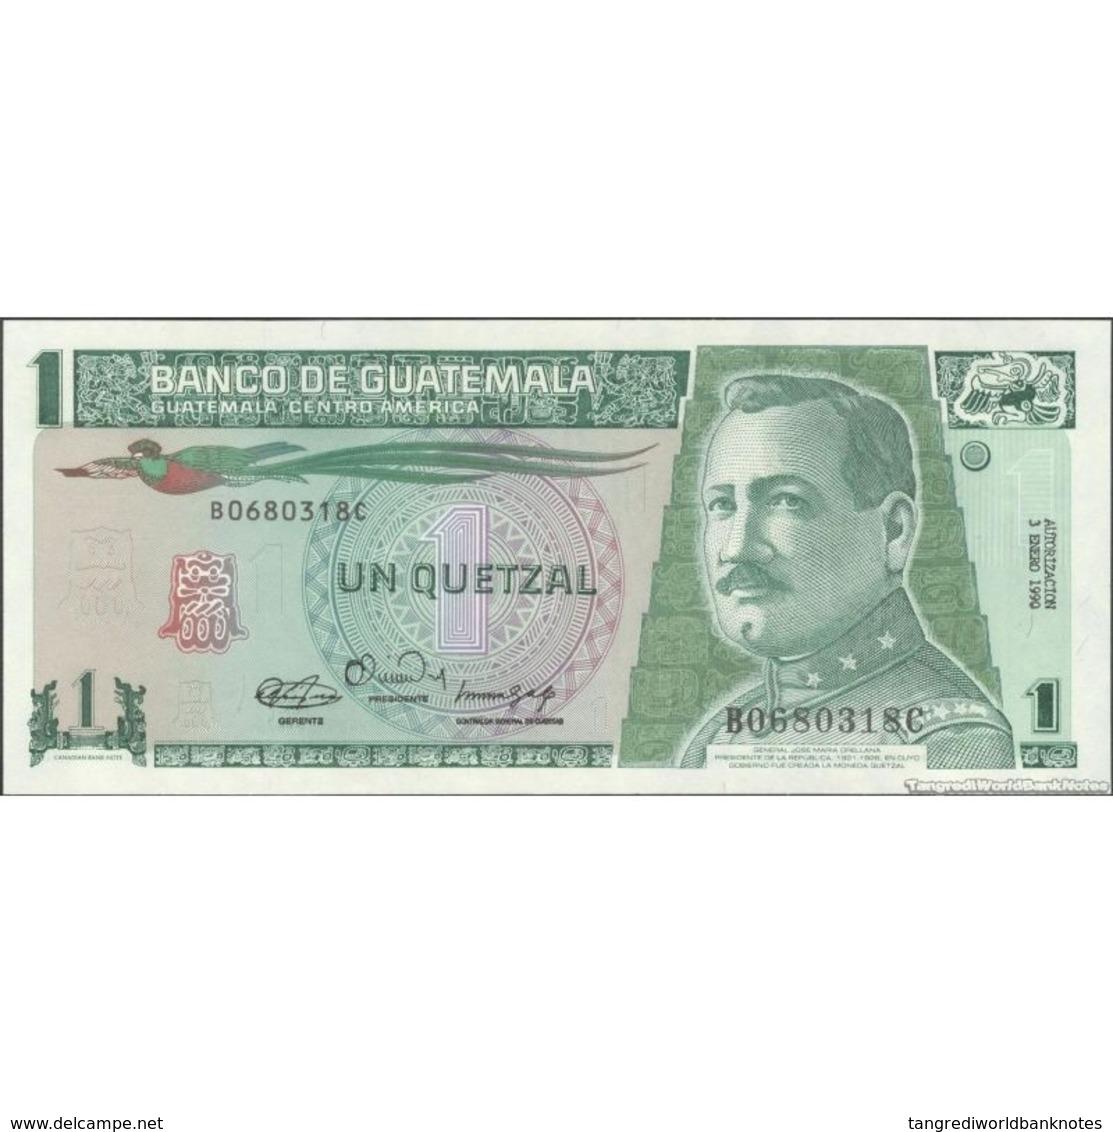 TWN - GUATEMALA 73a3 - 1 Quetzal 3.1.1990 B XXXXXXX C - Printer: CBNC UNC - Guatemala